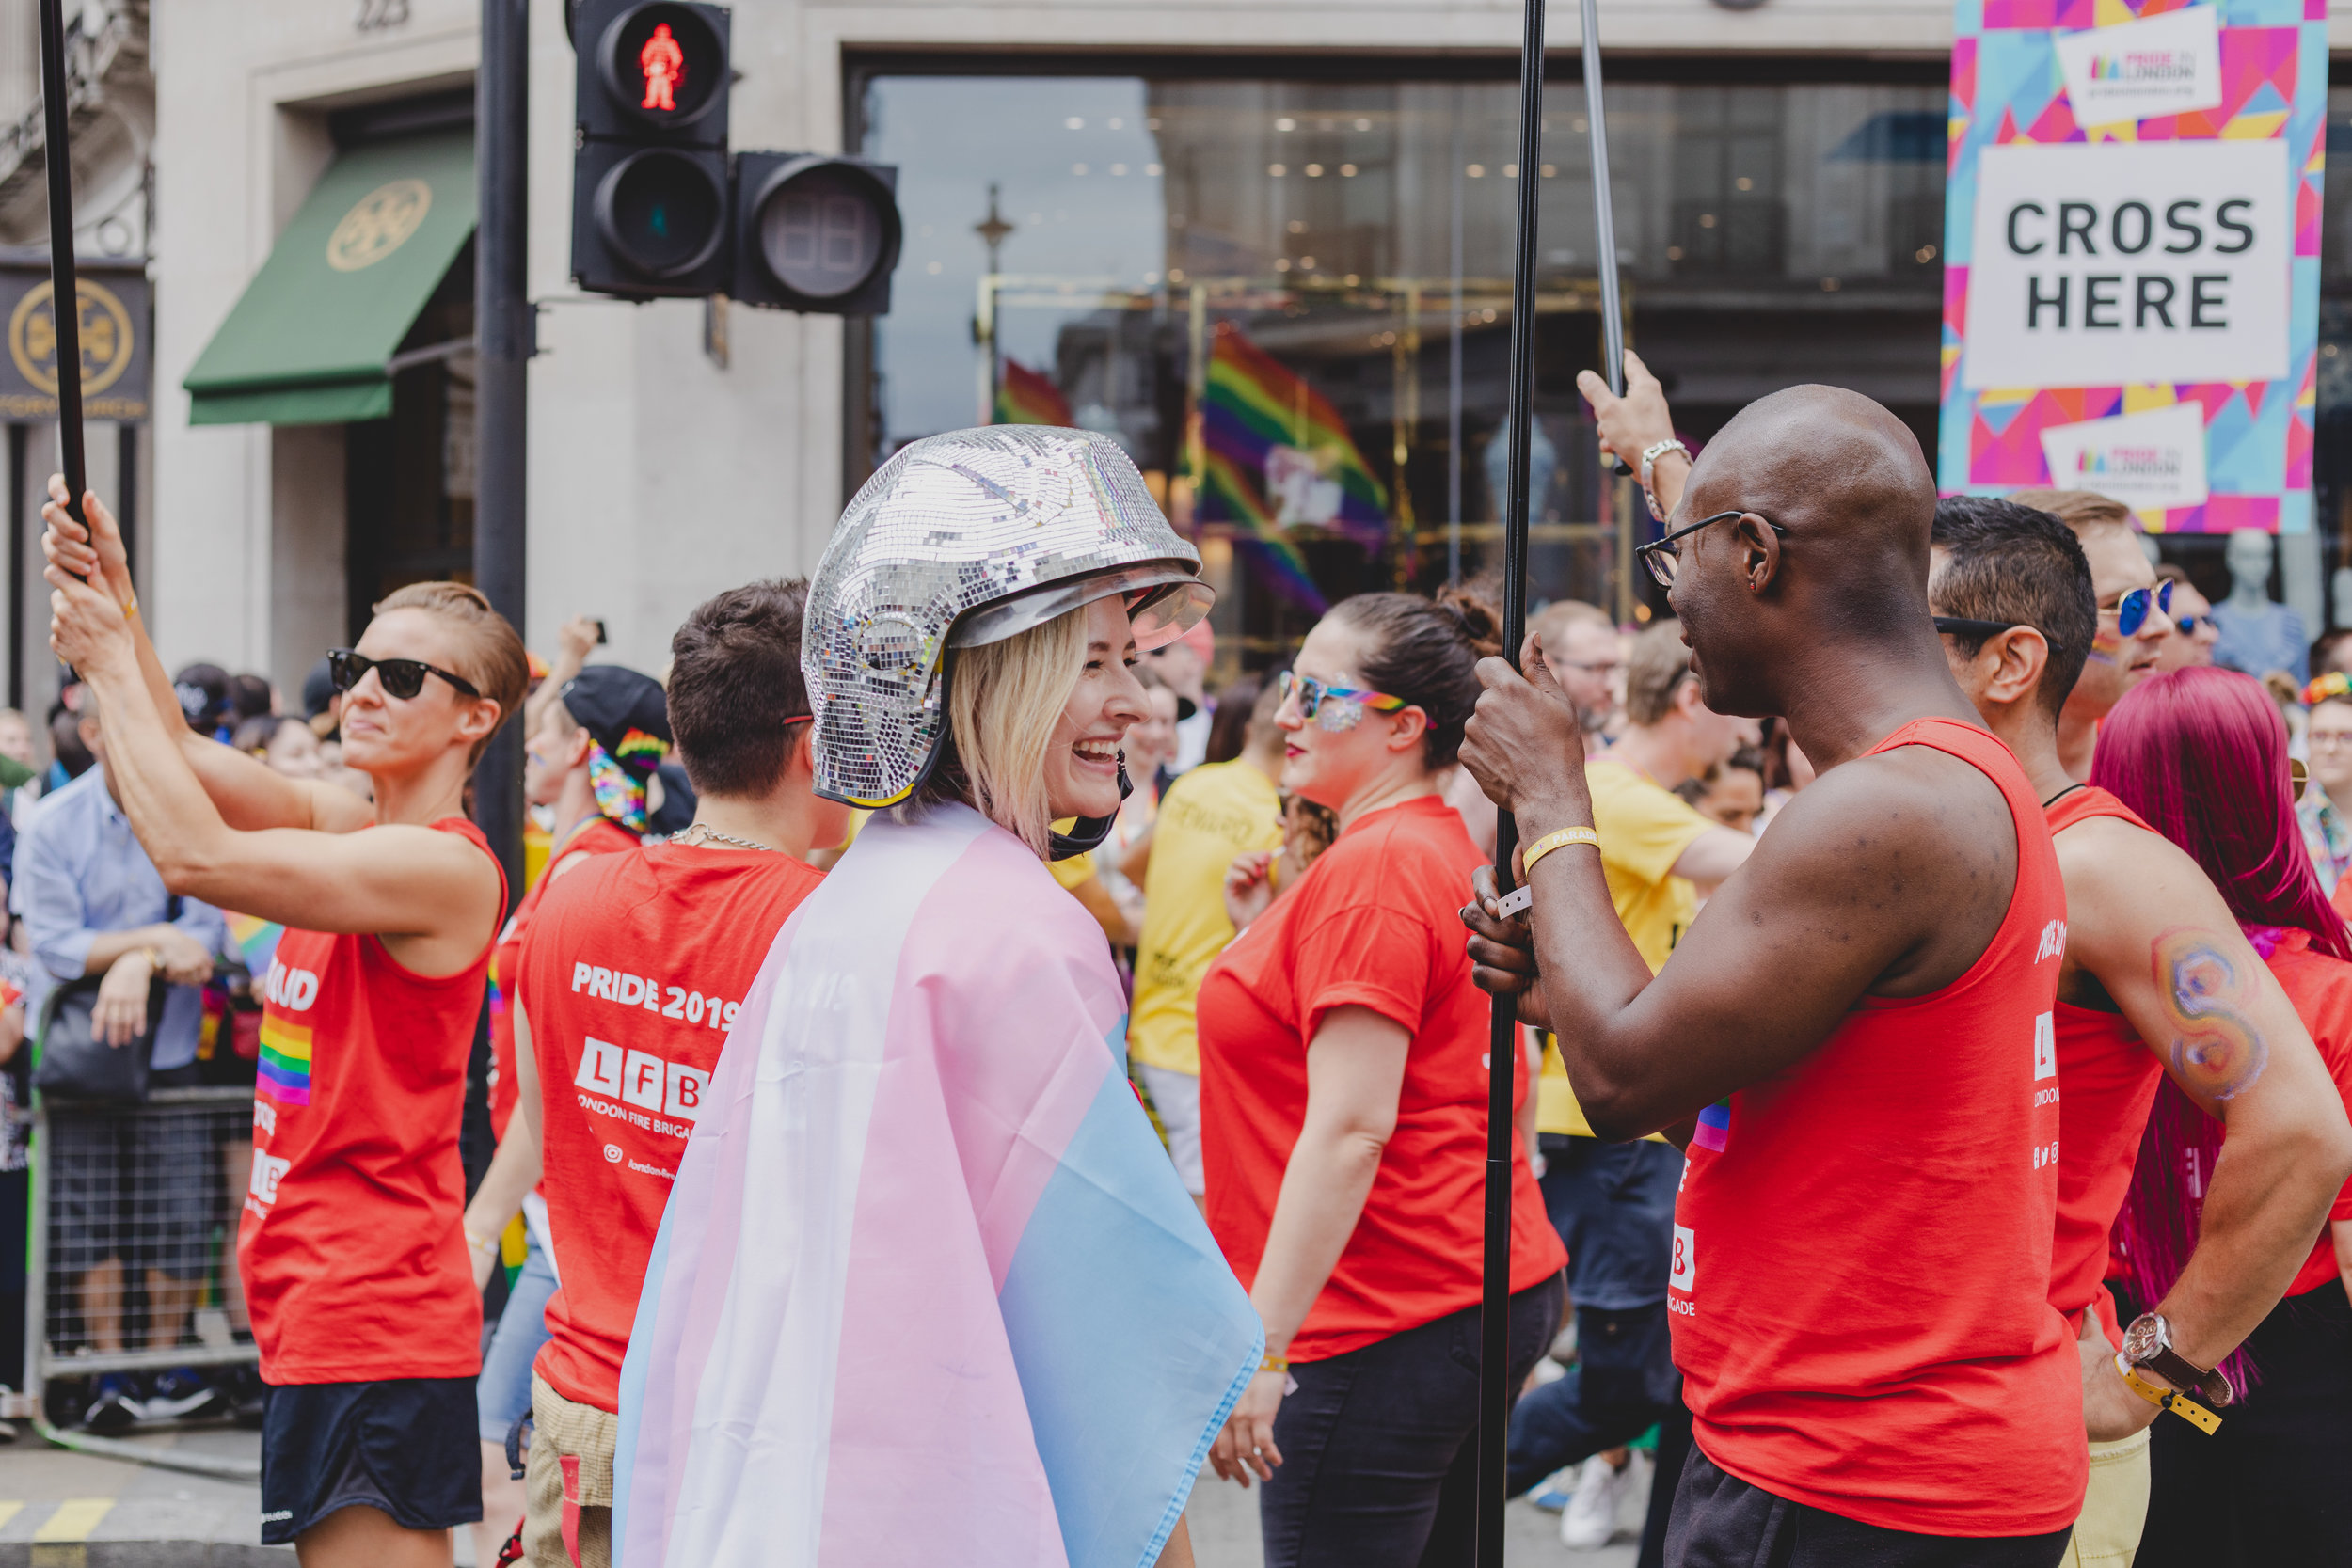 Pride in London 2019 - London Fire Brigade